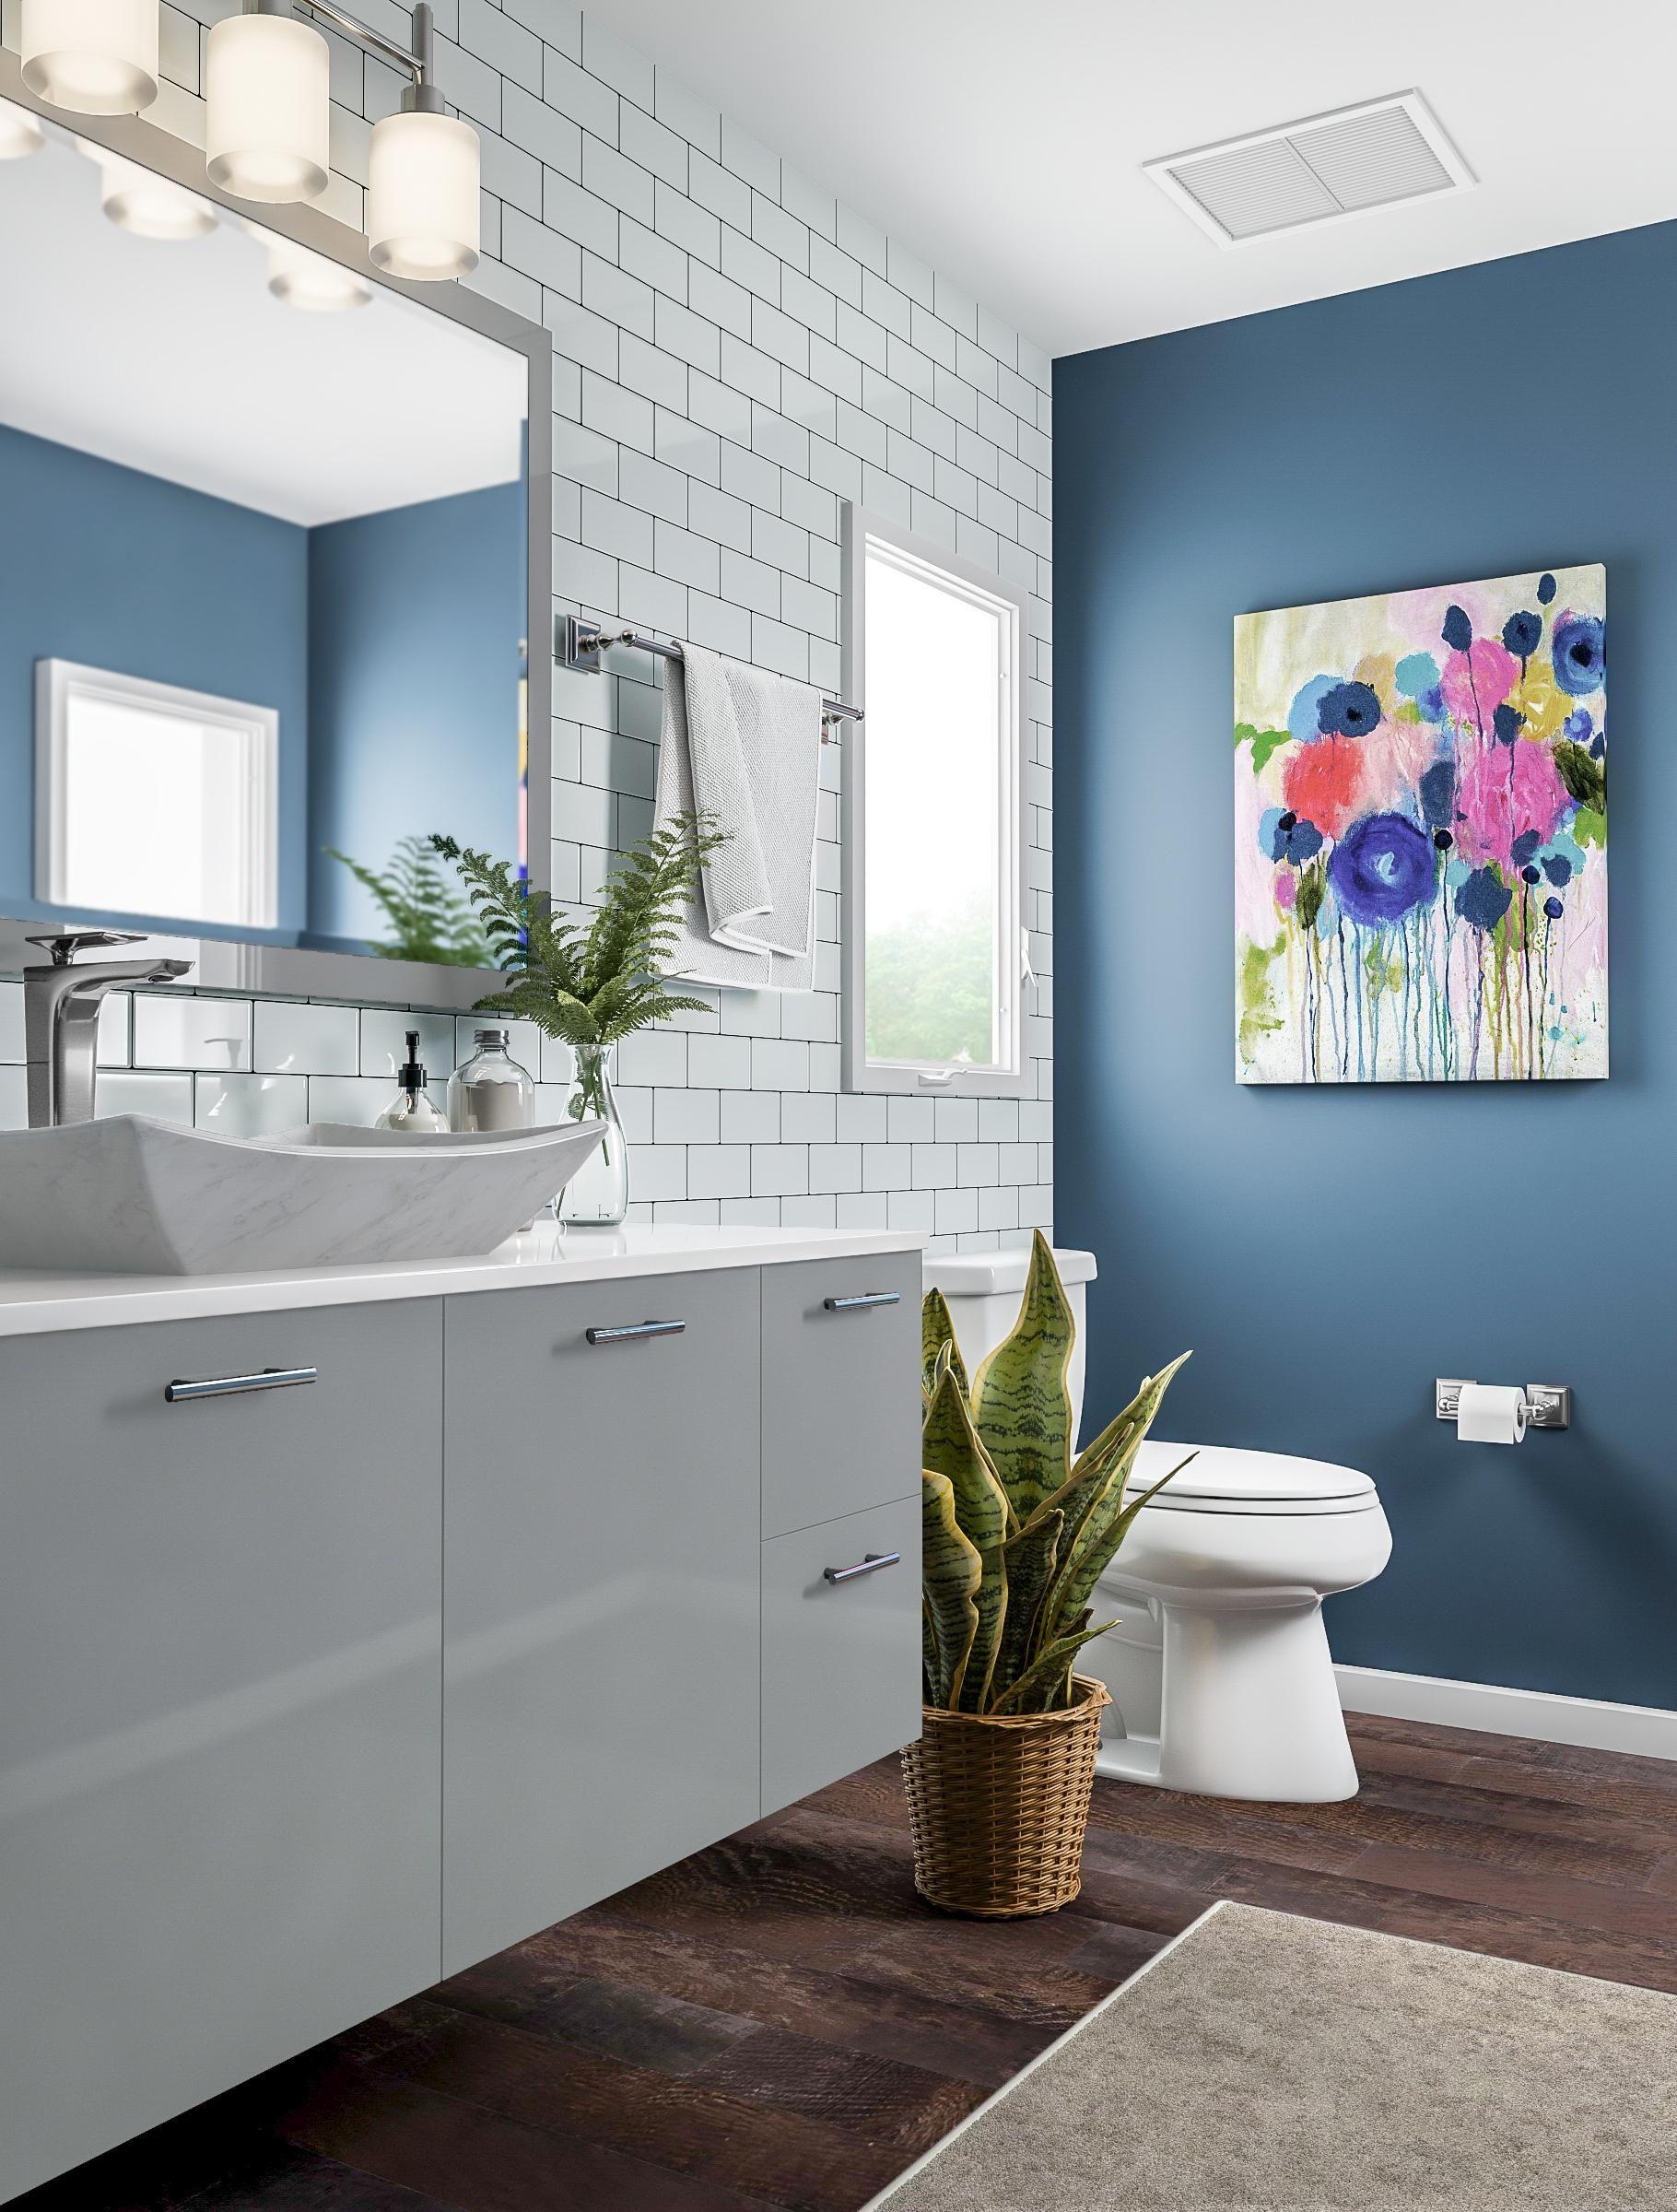 Chic Gray And Blue Bathroom Trendy Bathroom Tiles Wood Floor Bathroom Wood Bathroom